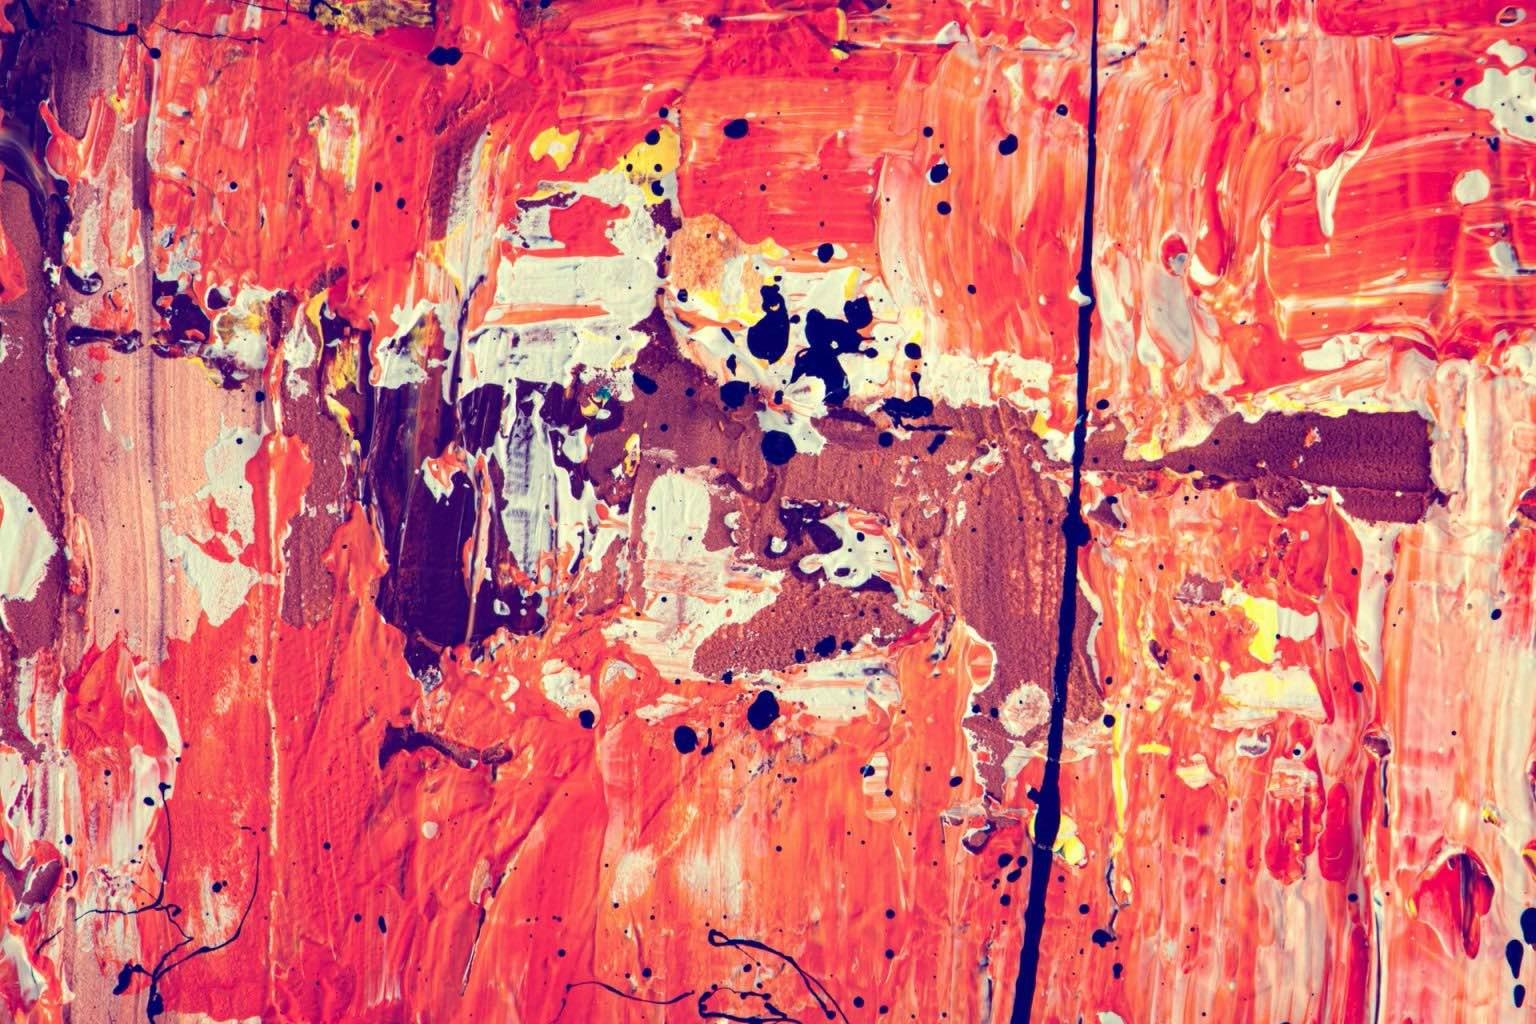 Glenstone Museum in Potomac: Explore 1,300 Works of Modern Art